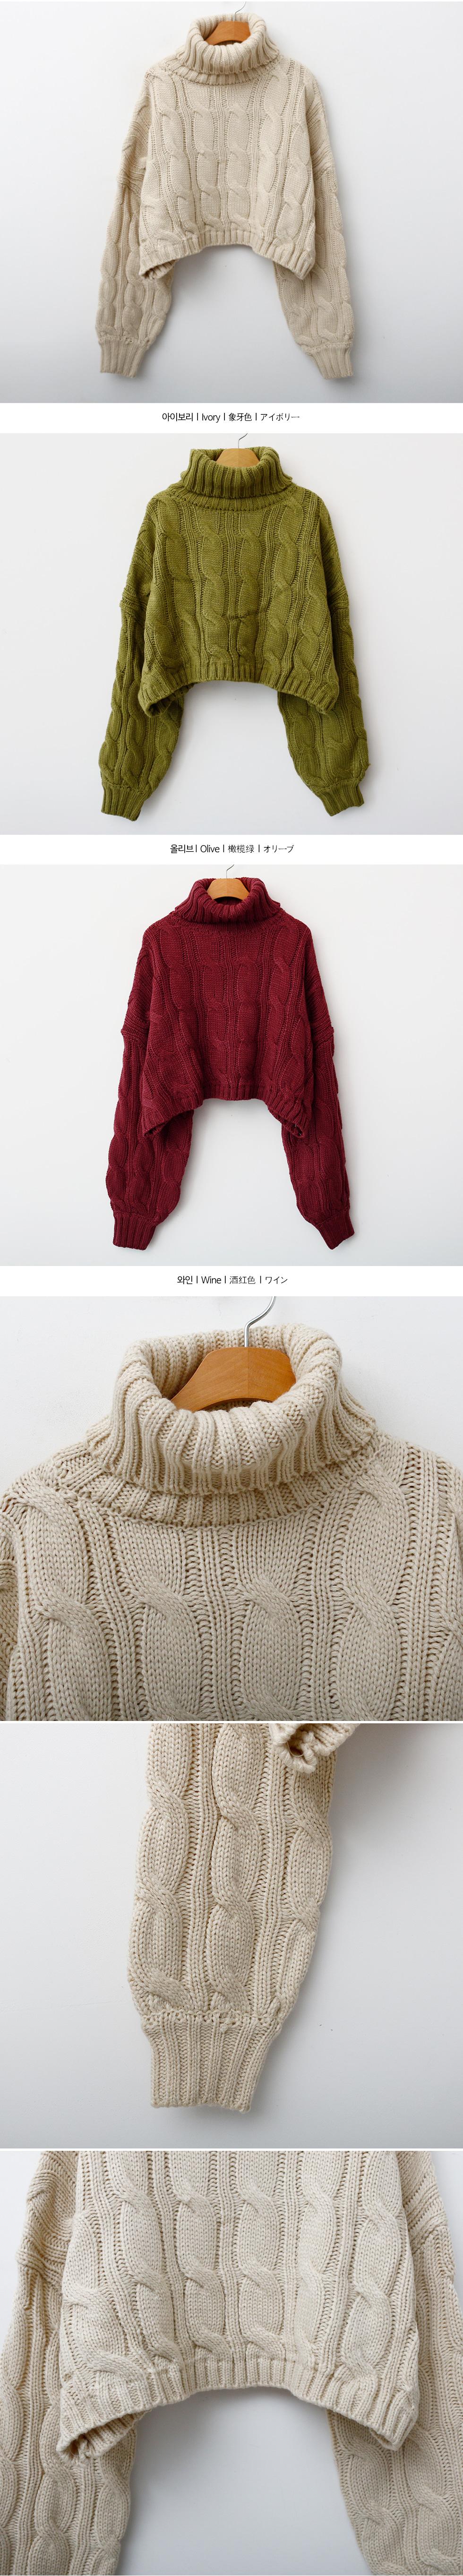 Crop Balloon Twisted Knitwear